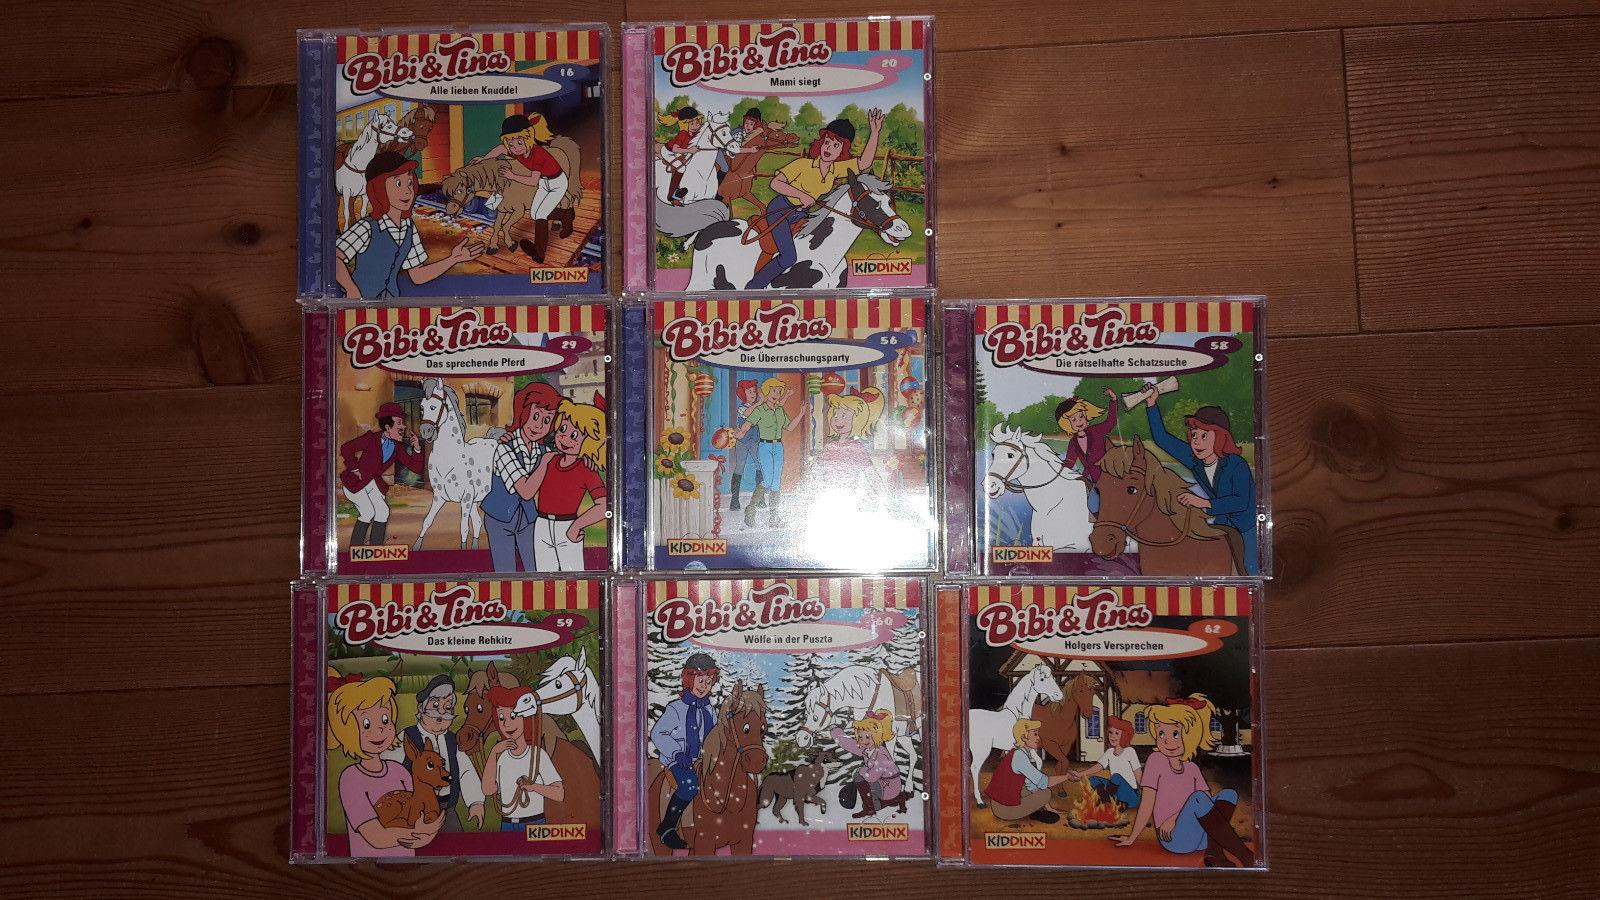 CD s Bibi und Tina Sammlung 8 Stück TOP